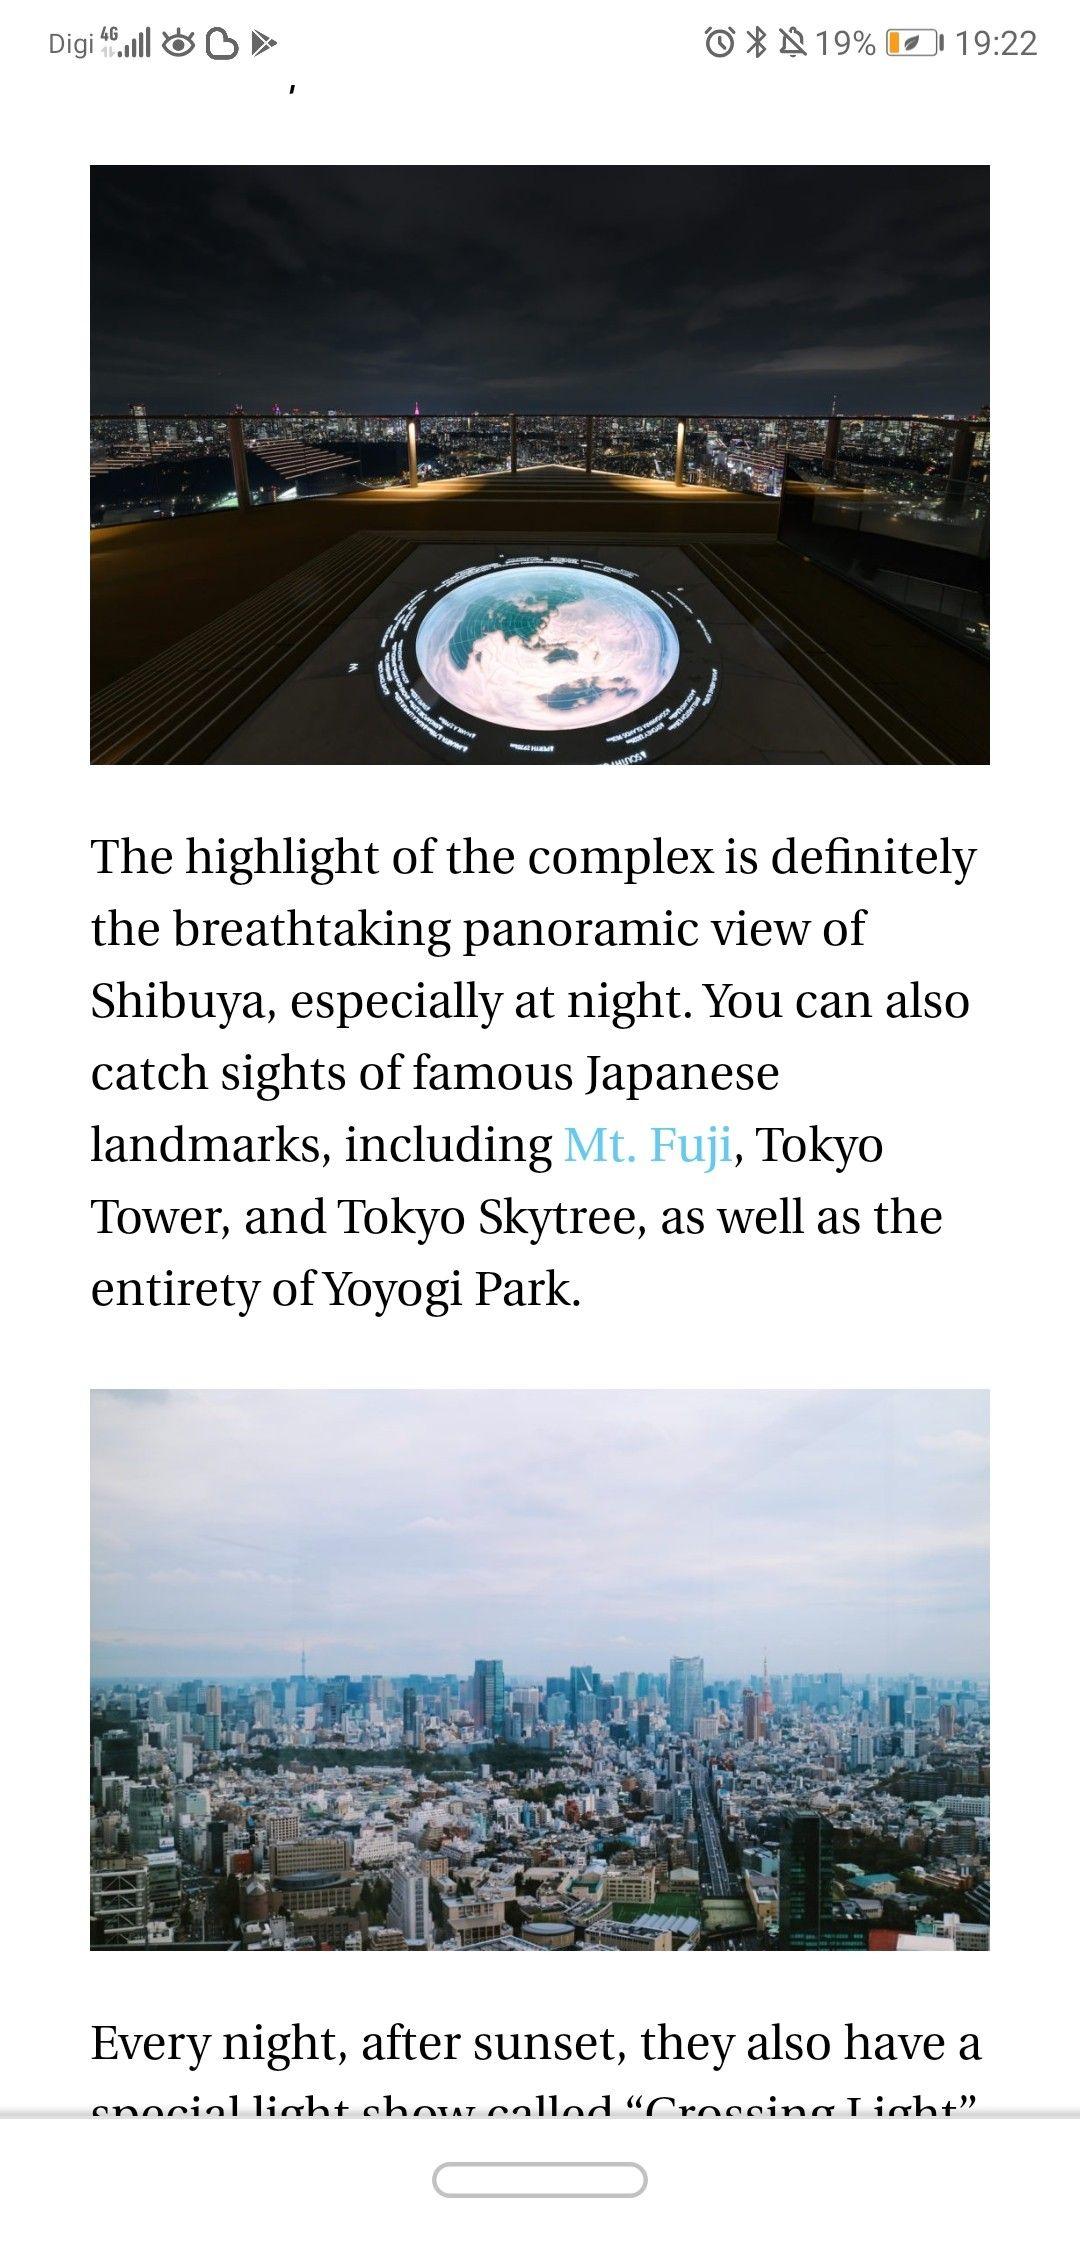 Pin By Rina Zamberi On Travelore In 2020 Tokyo Tower Tokyo Skytree Yoyogi Park